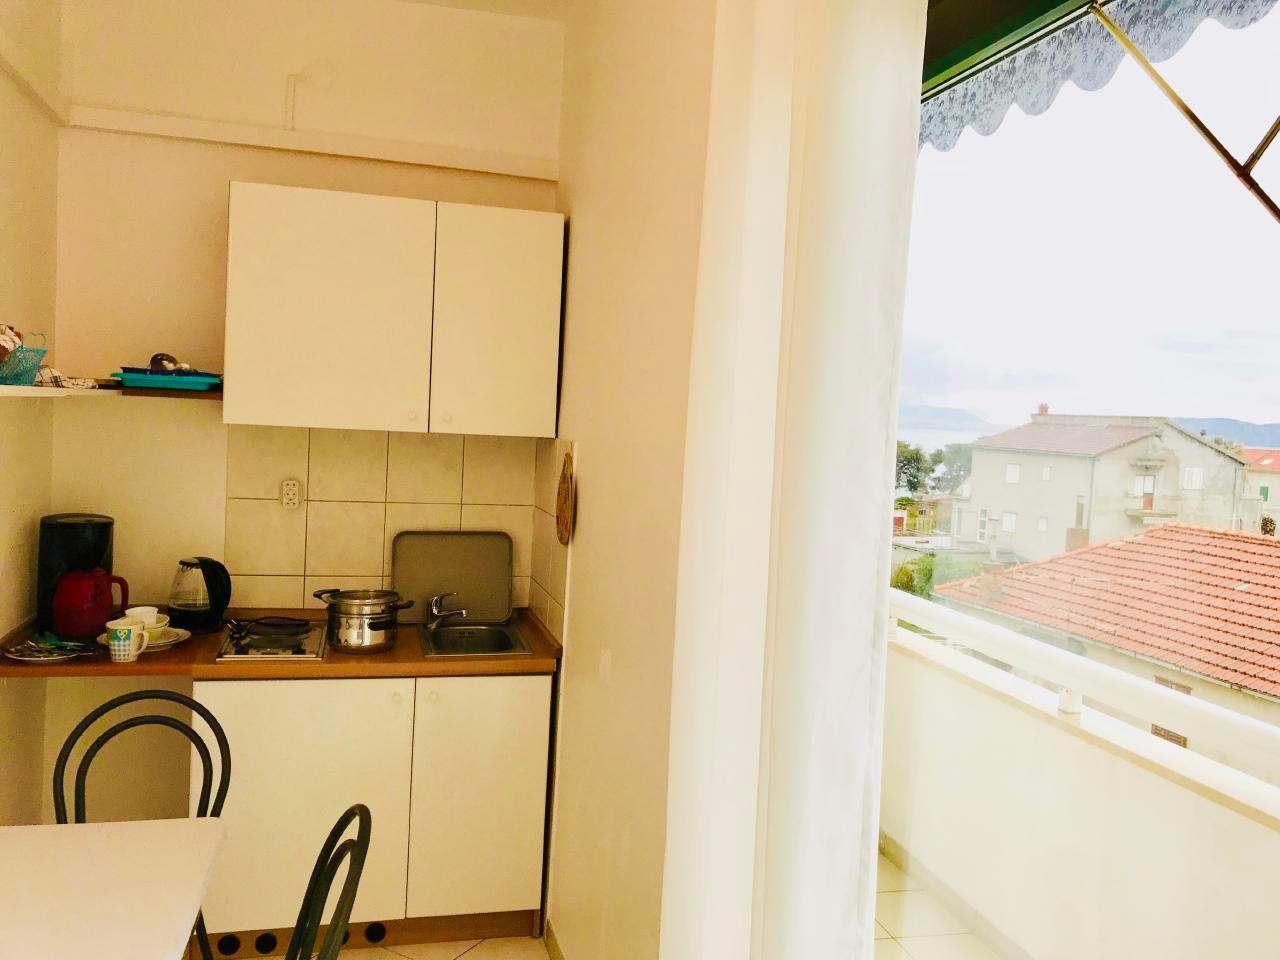 Ferienwohnung Apartmenthaus Ruza 7 - Studio (98388), Kaštel Štafilić, , Dalmatien, Kroatien, Bild 48